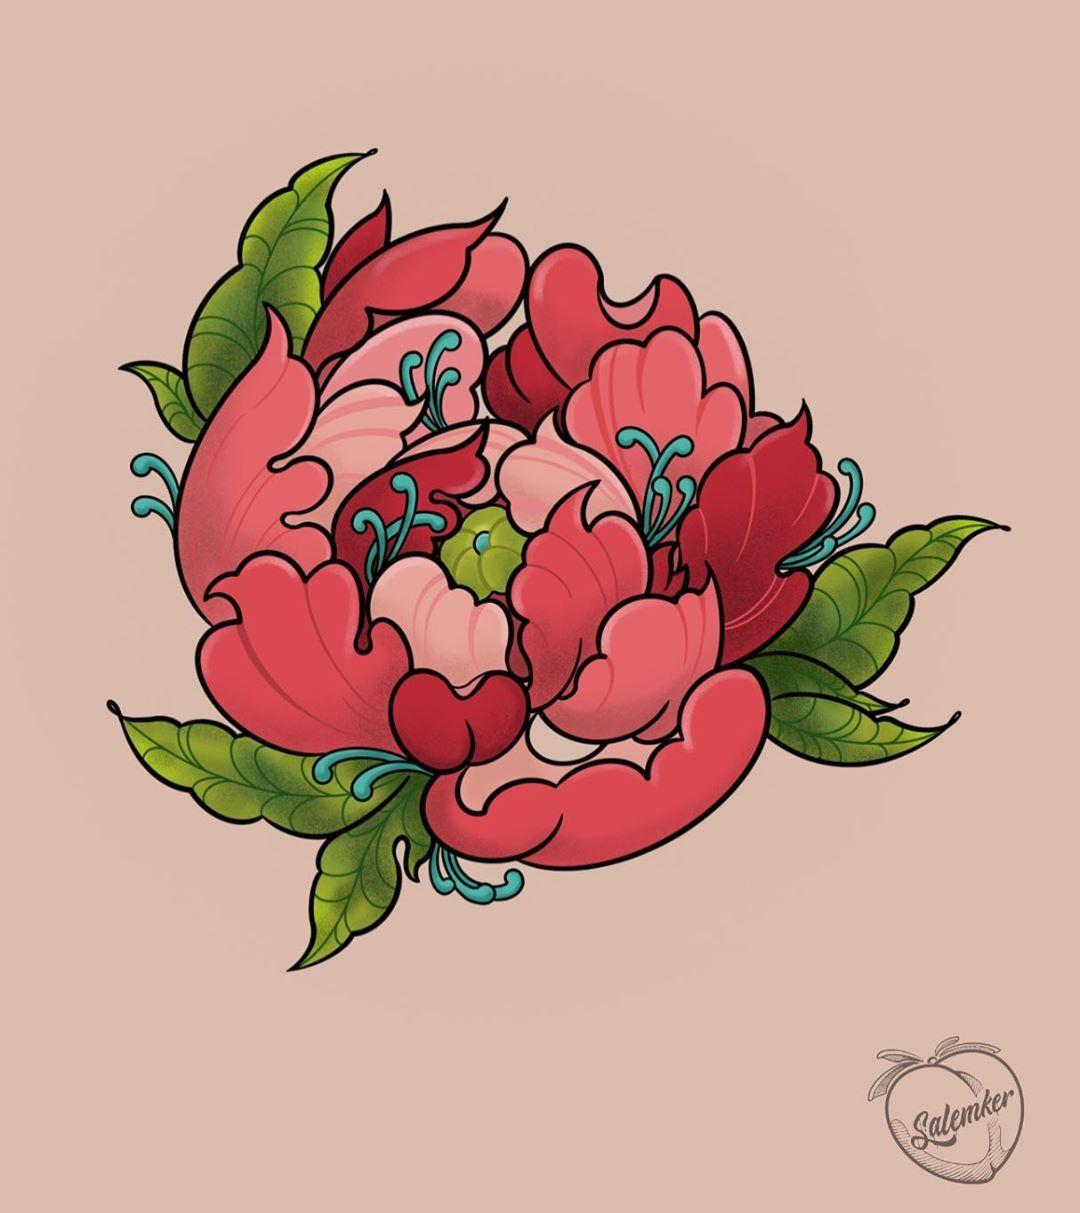 Una flor híbrida 🌺 . . . #peonies #peonias #peoniatattoo #peonytattoo #peony #peonytattoo #flowertattoo #neotraditional #neotraditionaltattoo #tattoo #flash #tattooflash #peachycolors #plants #draw #procreate #pink #petal #cdmx